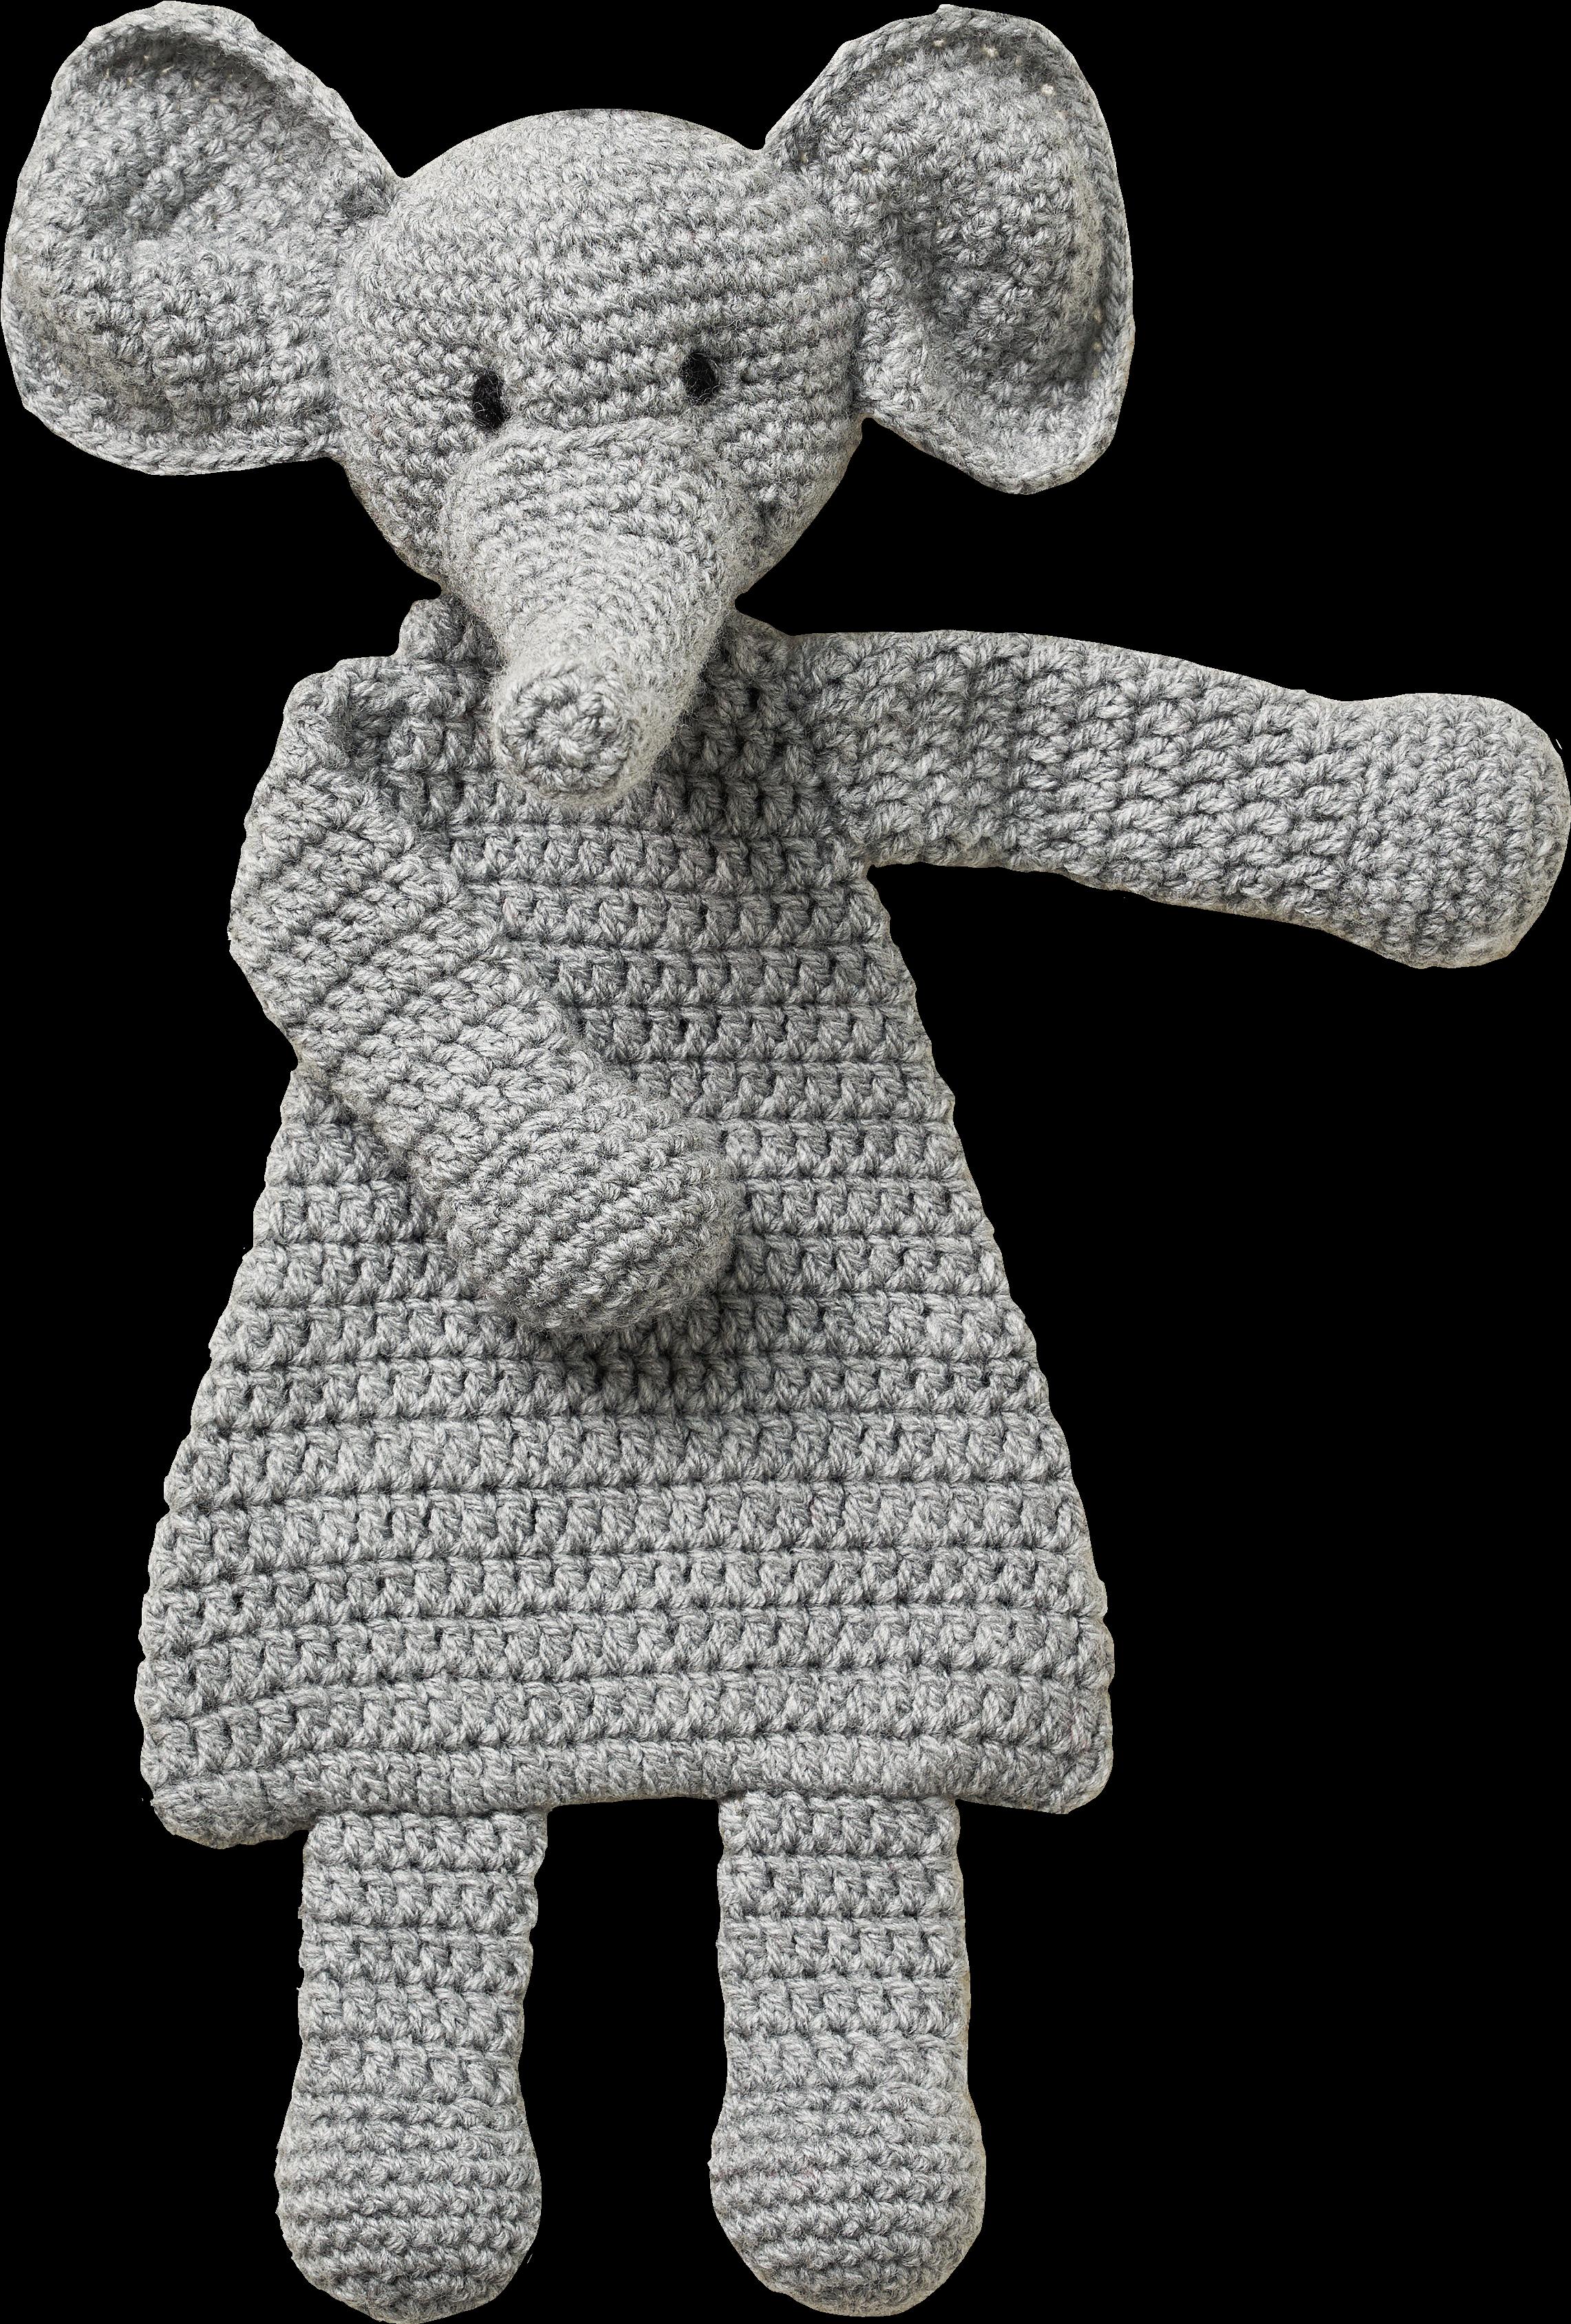 Adorable Crochet Elephant Applique Free Pattern - Knit And Crochet ... | 3377x2283